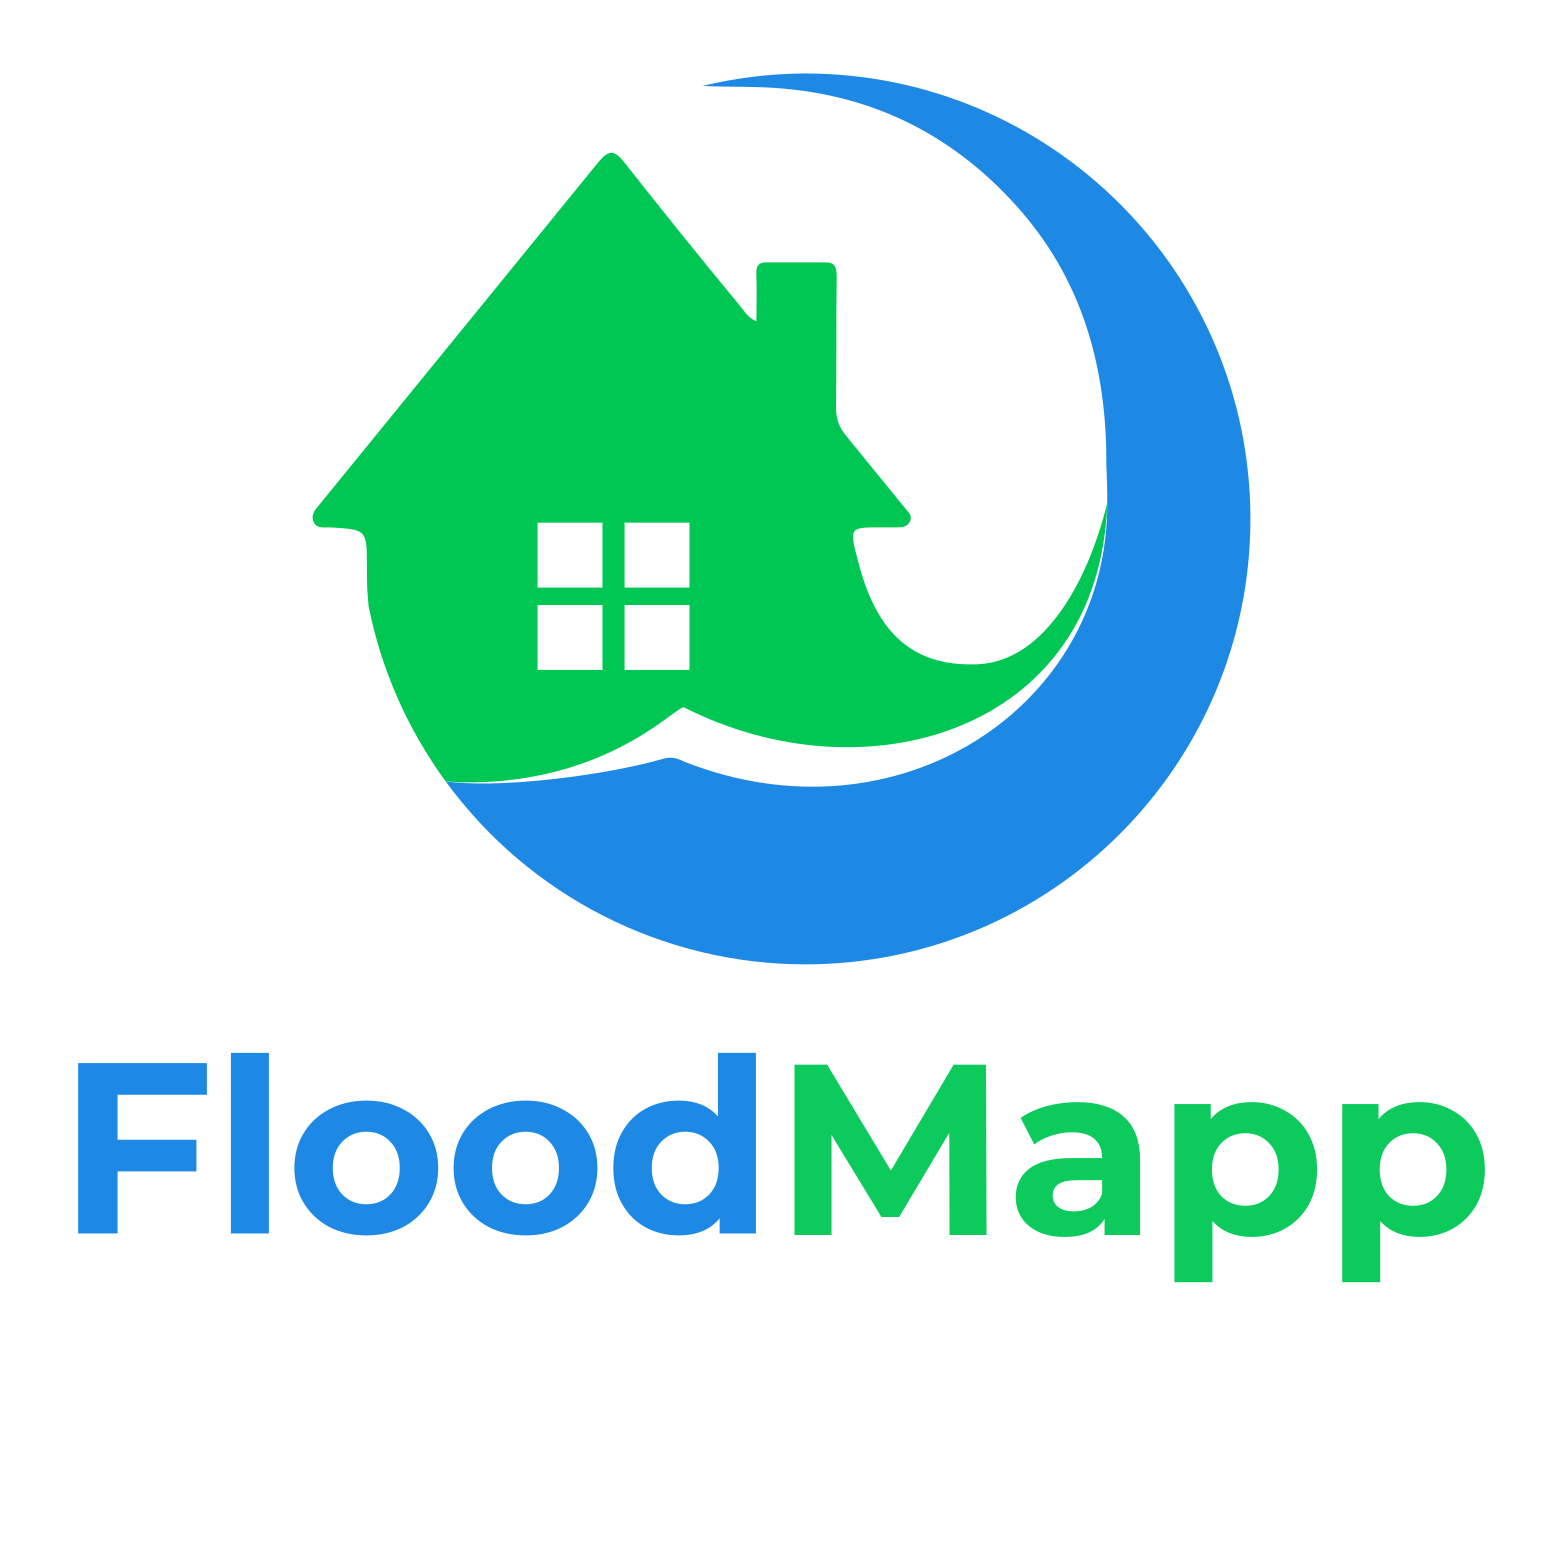 FloodMapp_LogoOverText.png